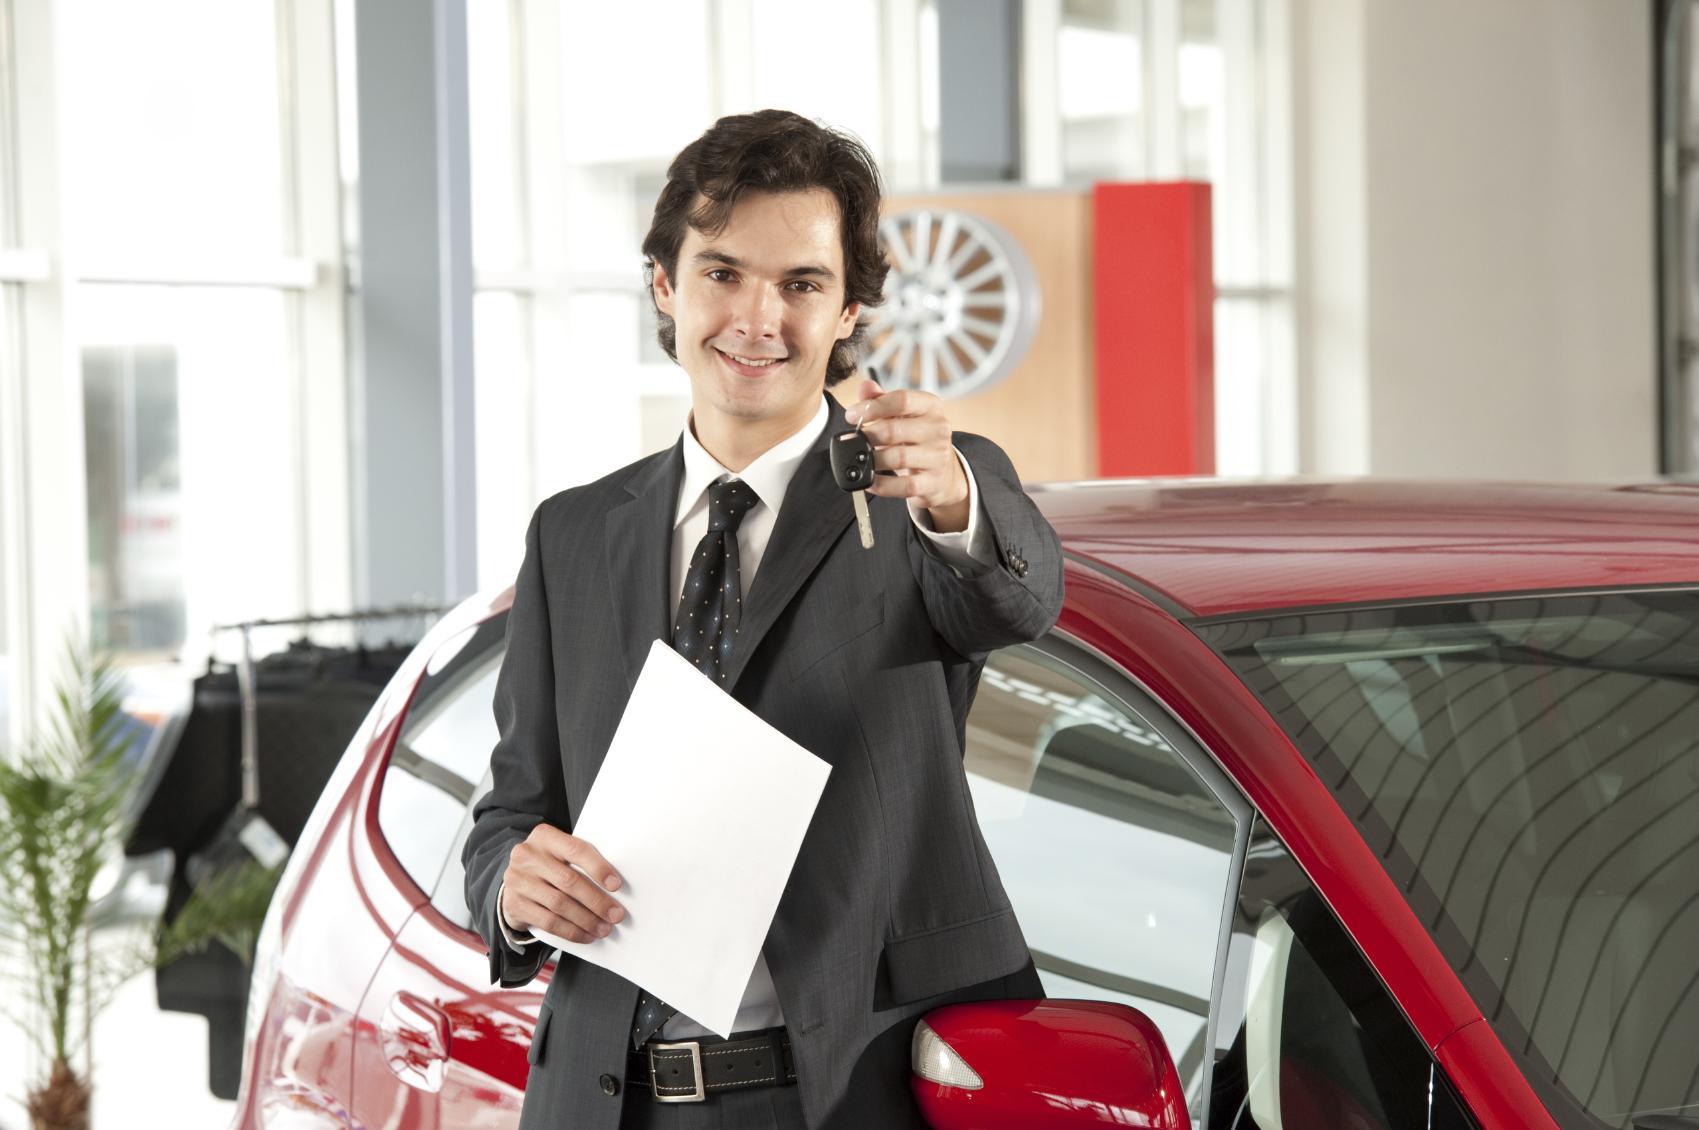 Get A West Virginia Motor Vehicle Dealer Bond Regardless Of Credit Surety Bond Insider